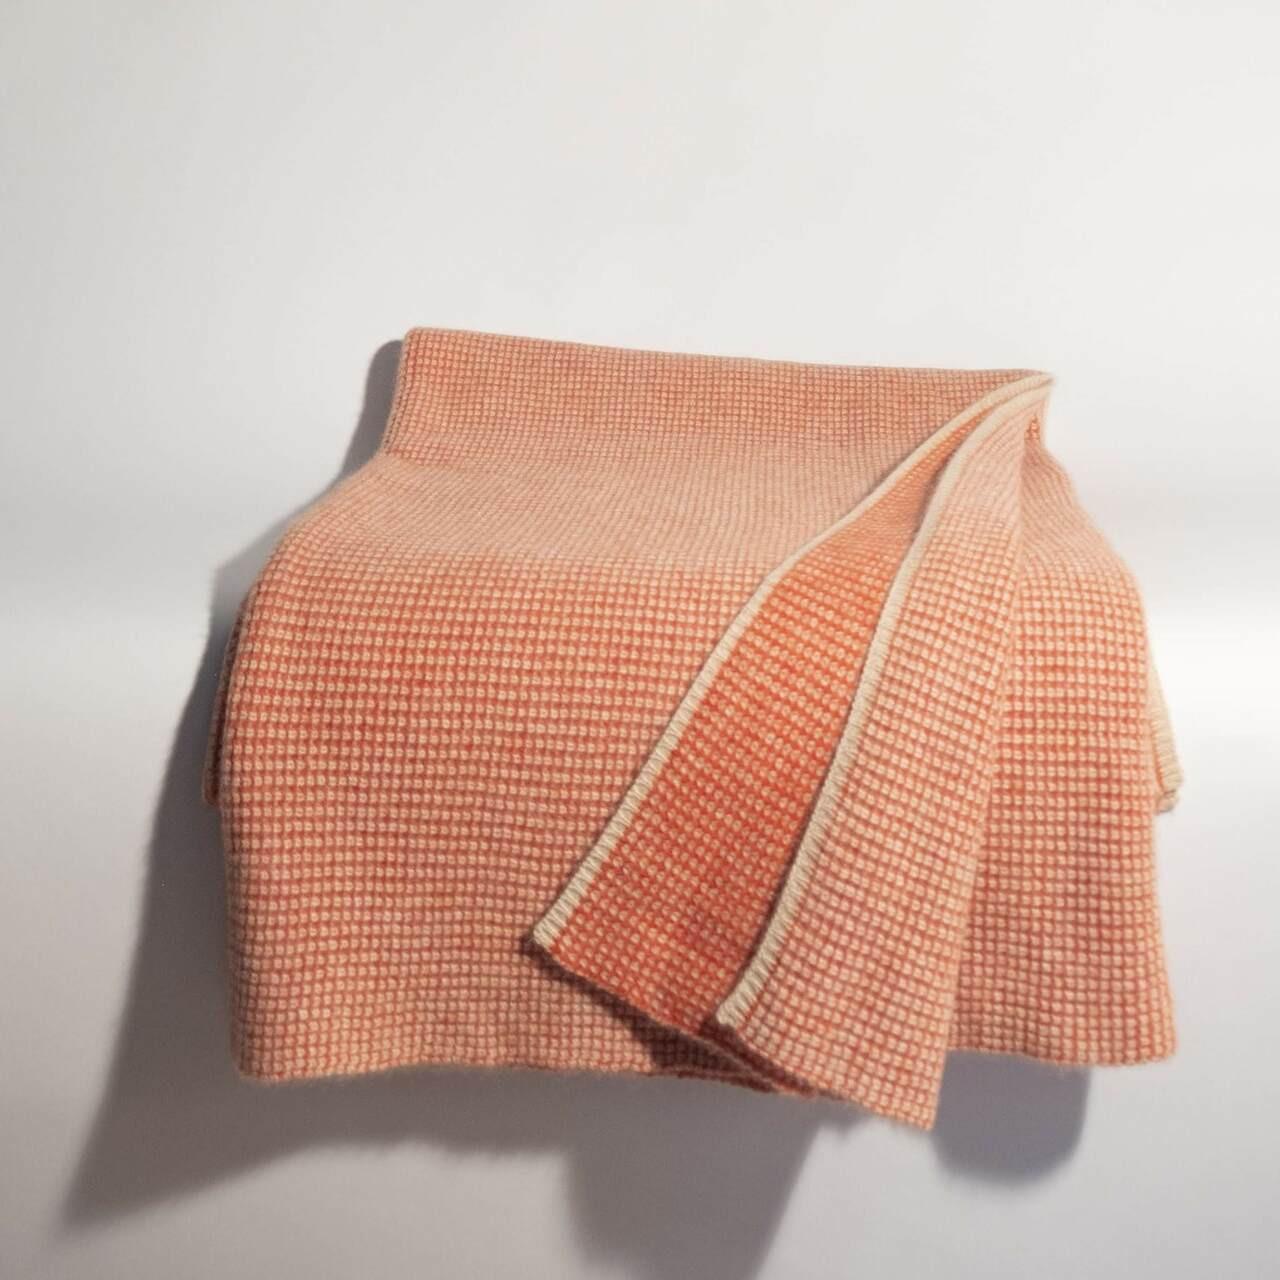 Burnt Orange & Organic Brown Waffle Knit Cashmere Throw